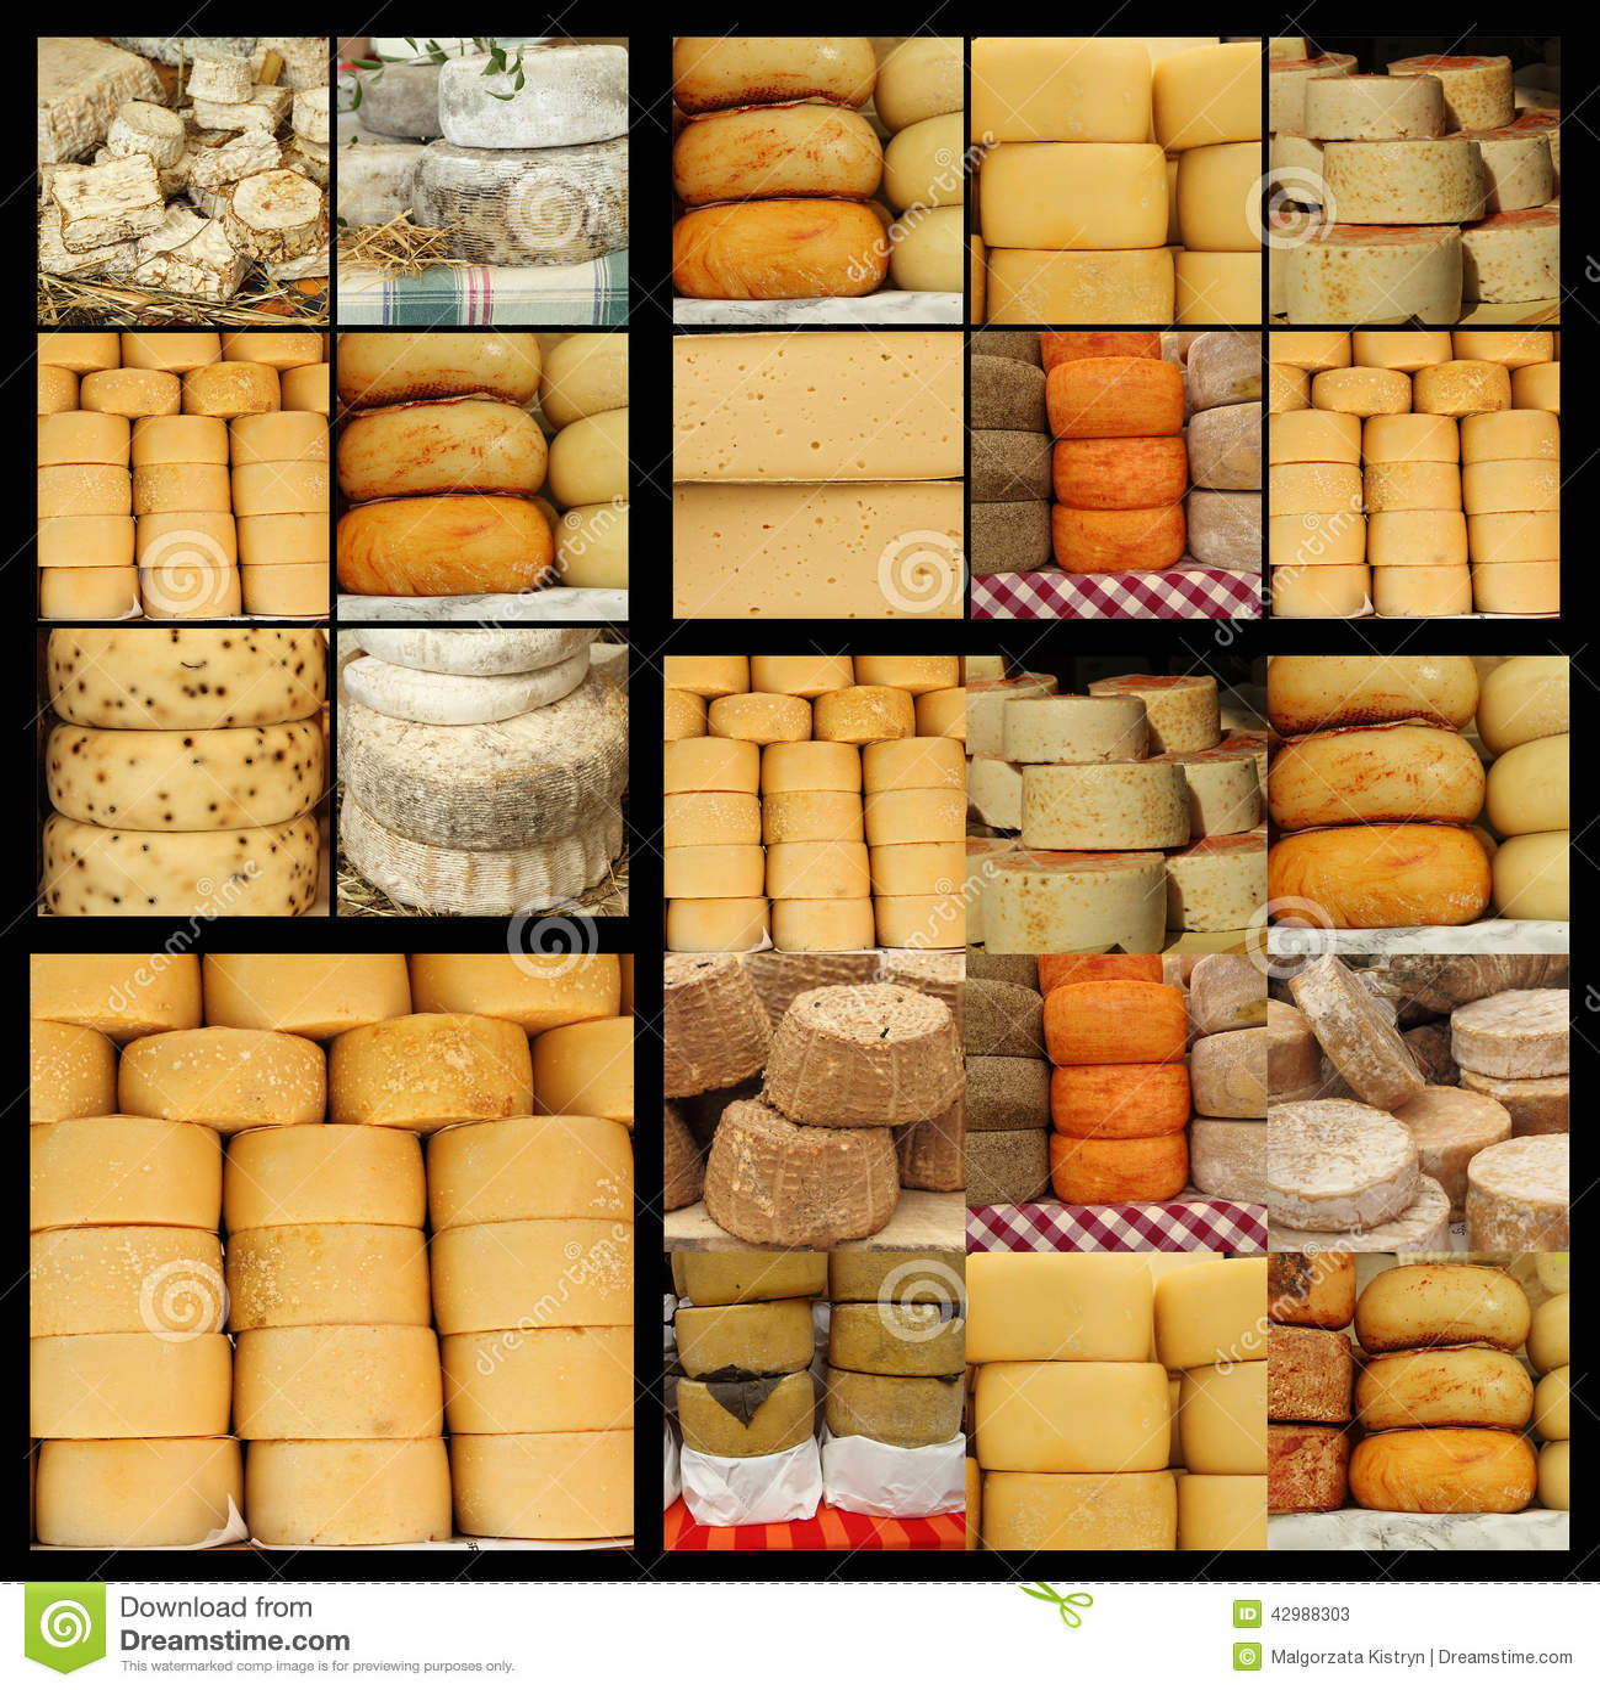 Cheese Collage Stock Image Cartoondealer Com 42988303